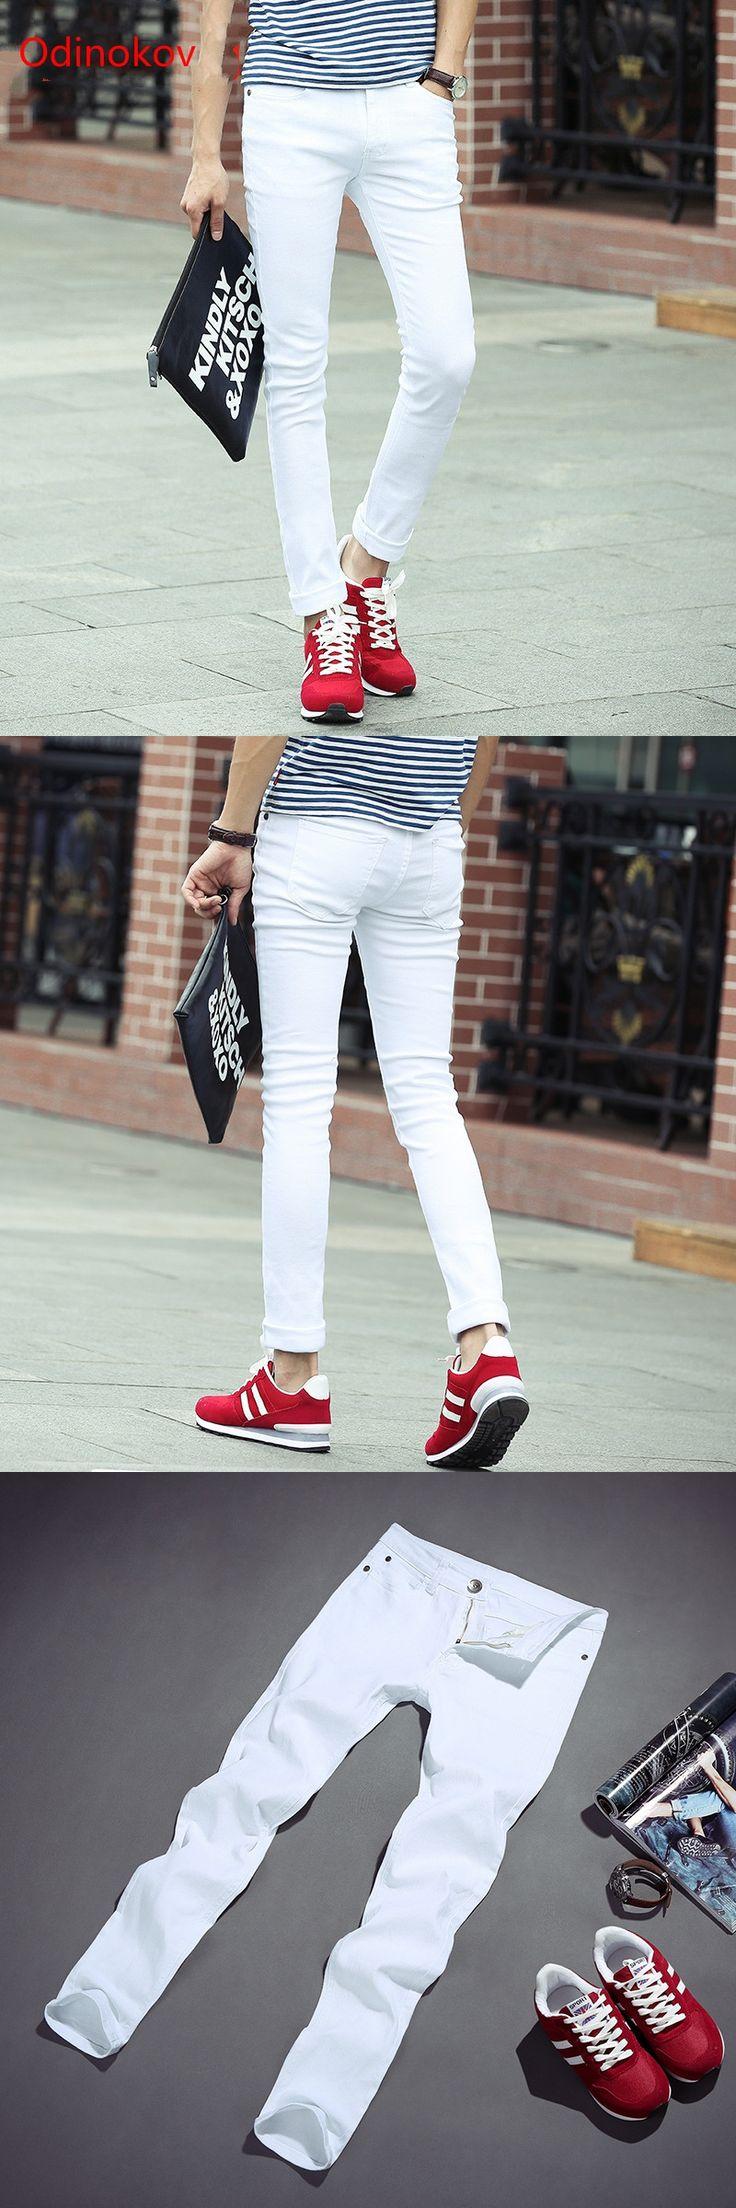 2017 New Arrival  Zipper Fly Slim Mid Plaid Pencil Pants Men White Jeans Fashion Design Slim Fit Casual Skinny Jeans For Men